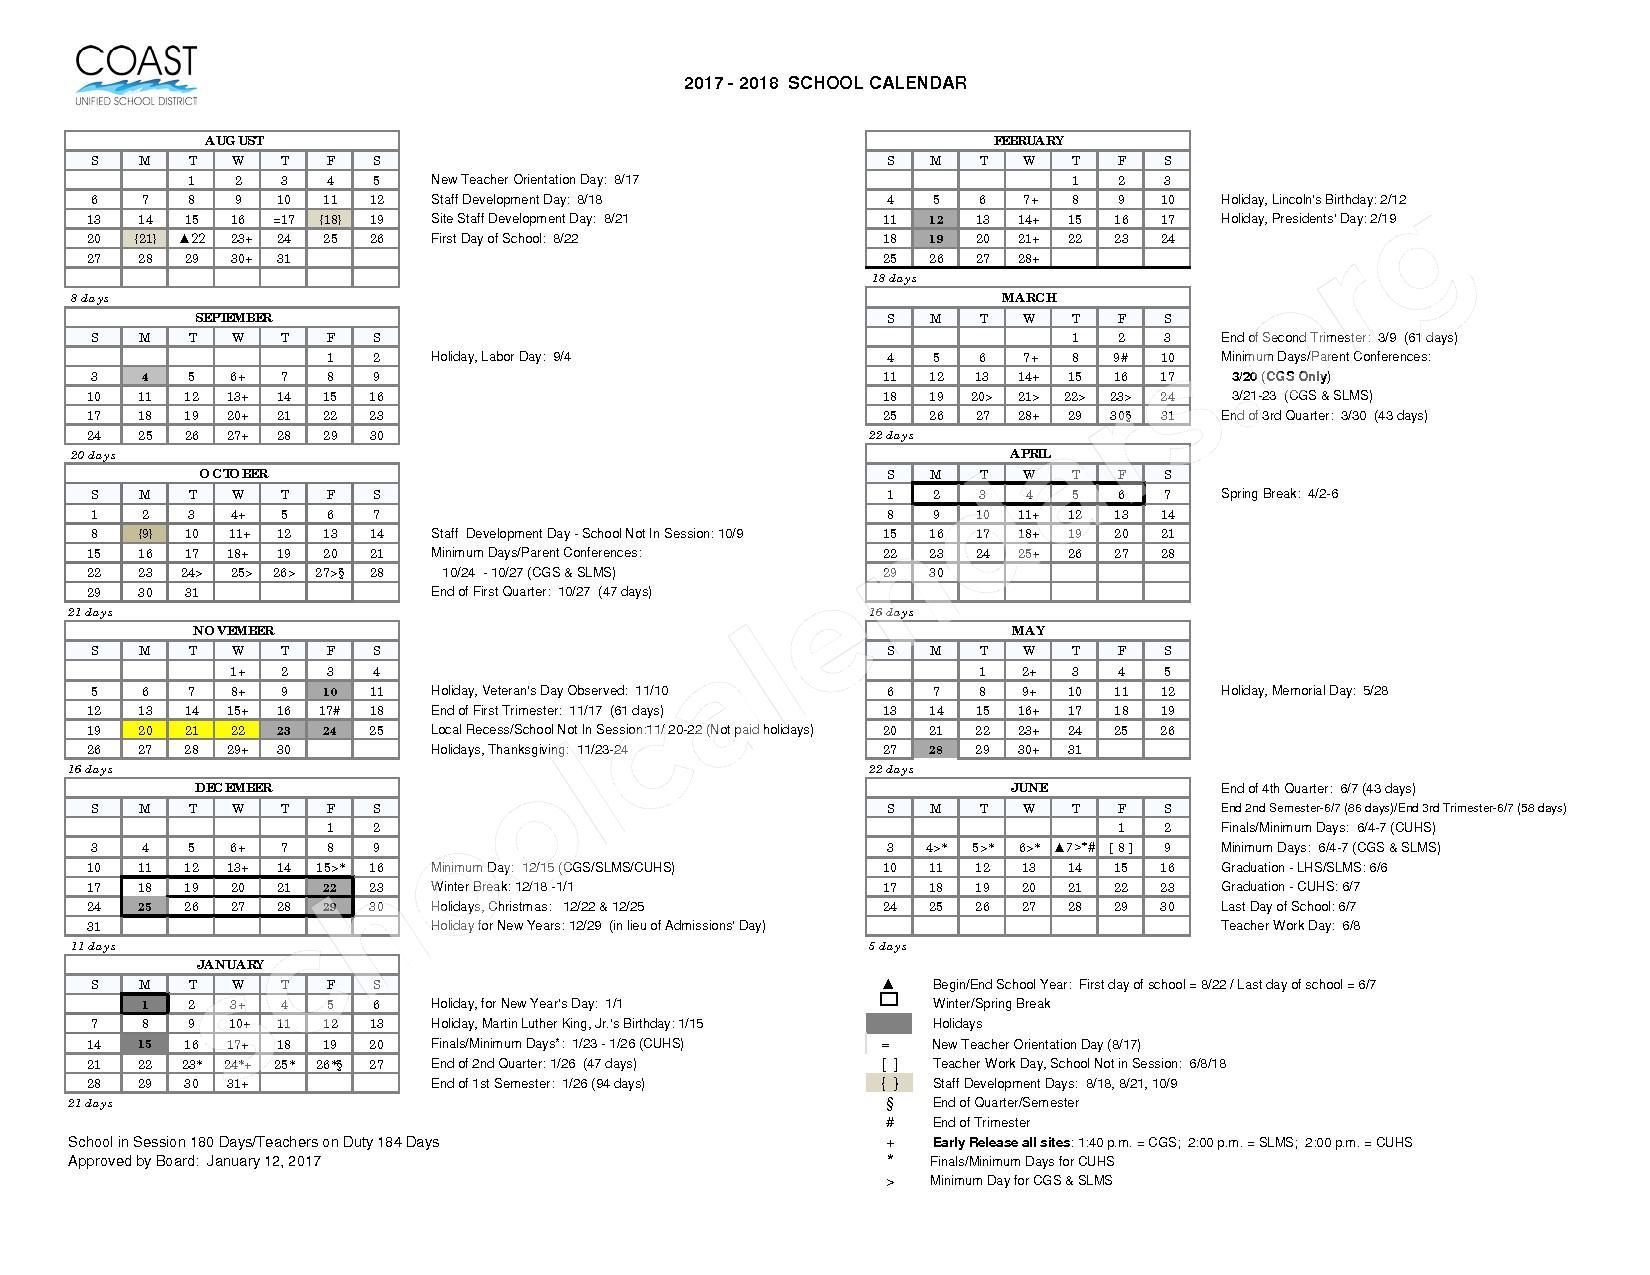 2017 - 2018 District Calendar – Coast Unified School District – page 1